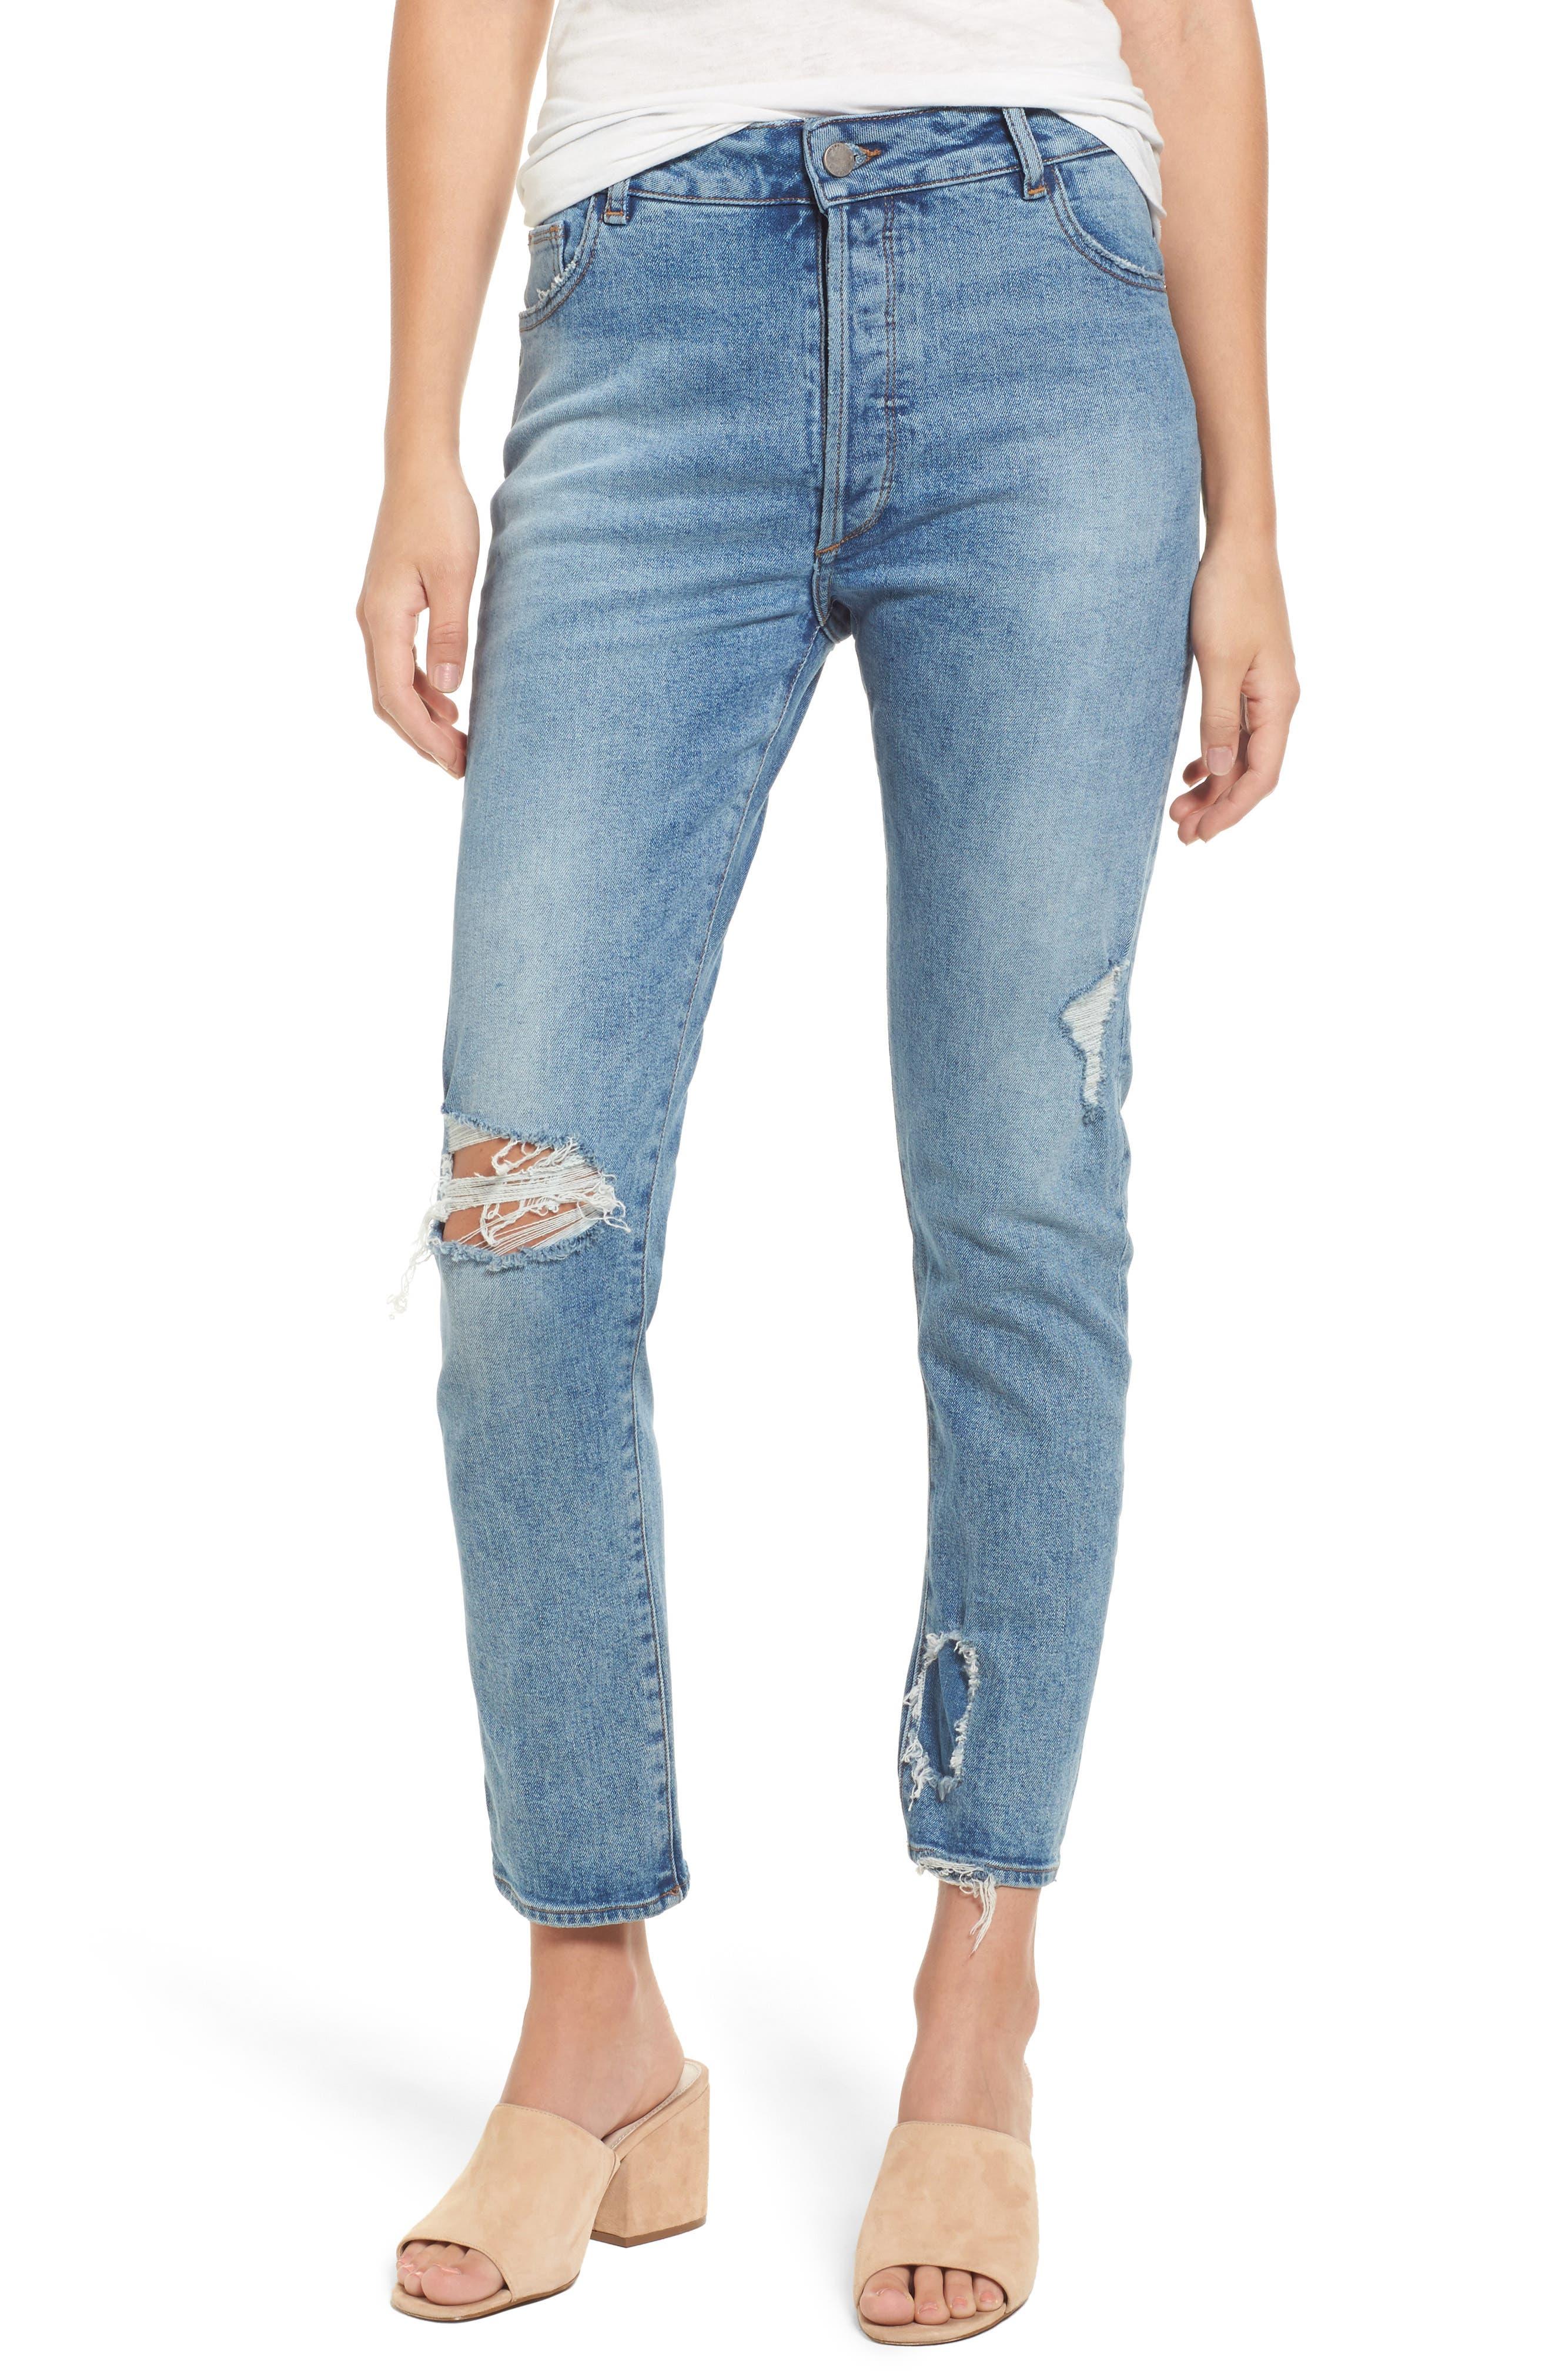 DL1961 Bella Vintage Ankle Skinny Jeans (Ponderosa)